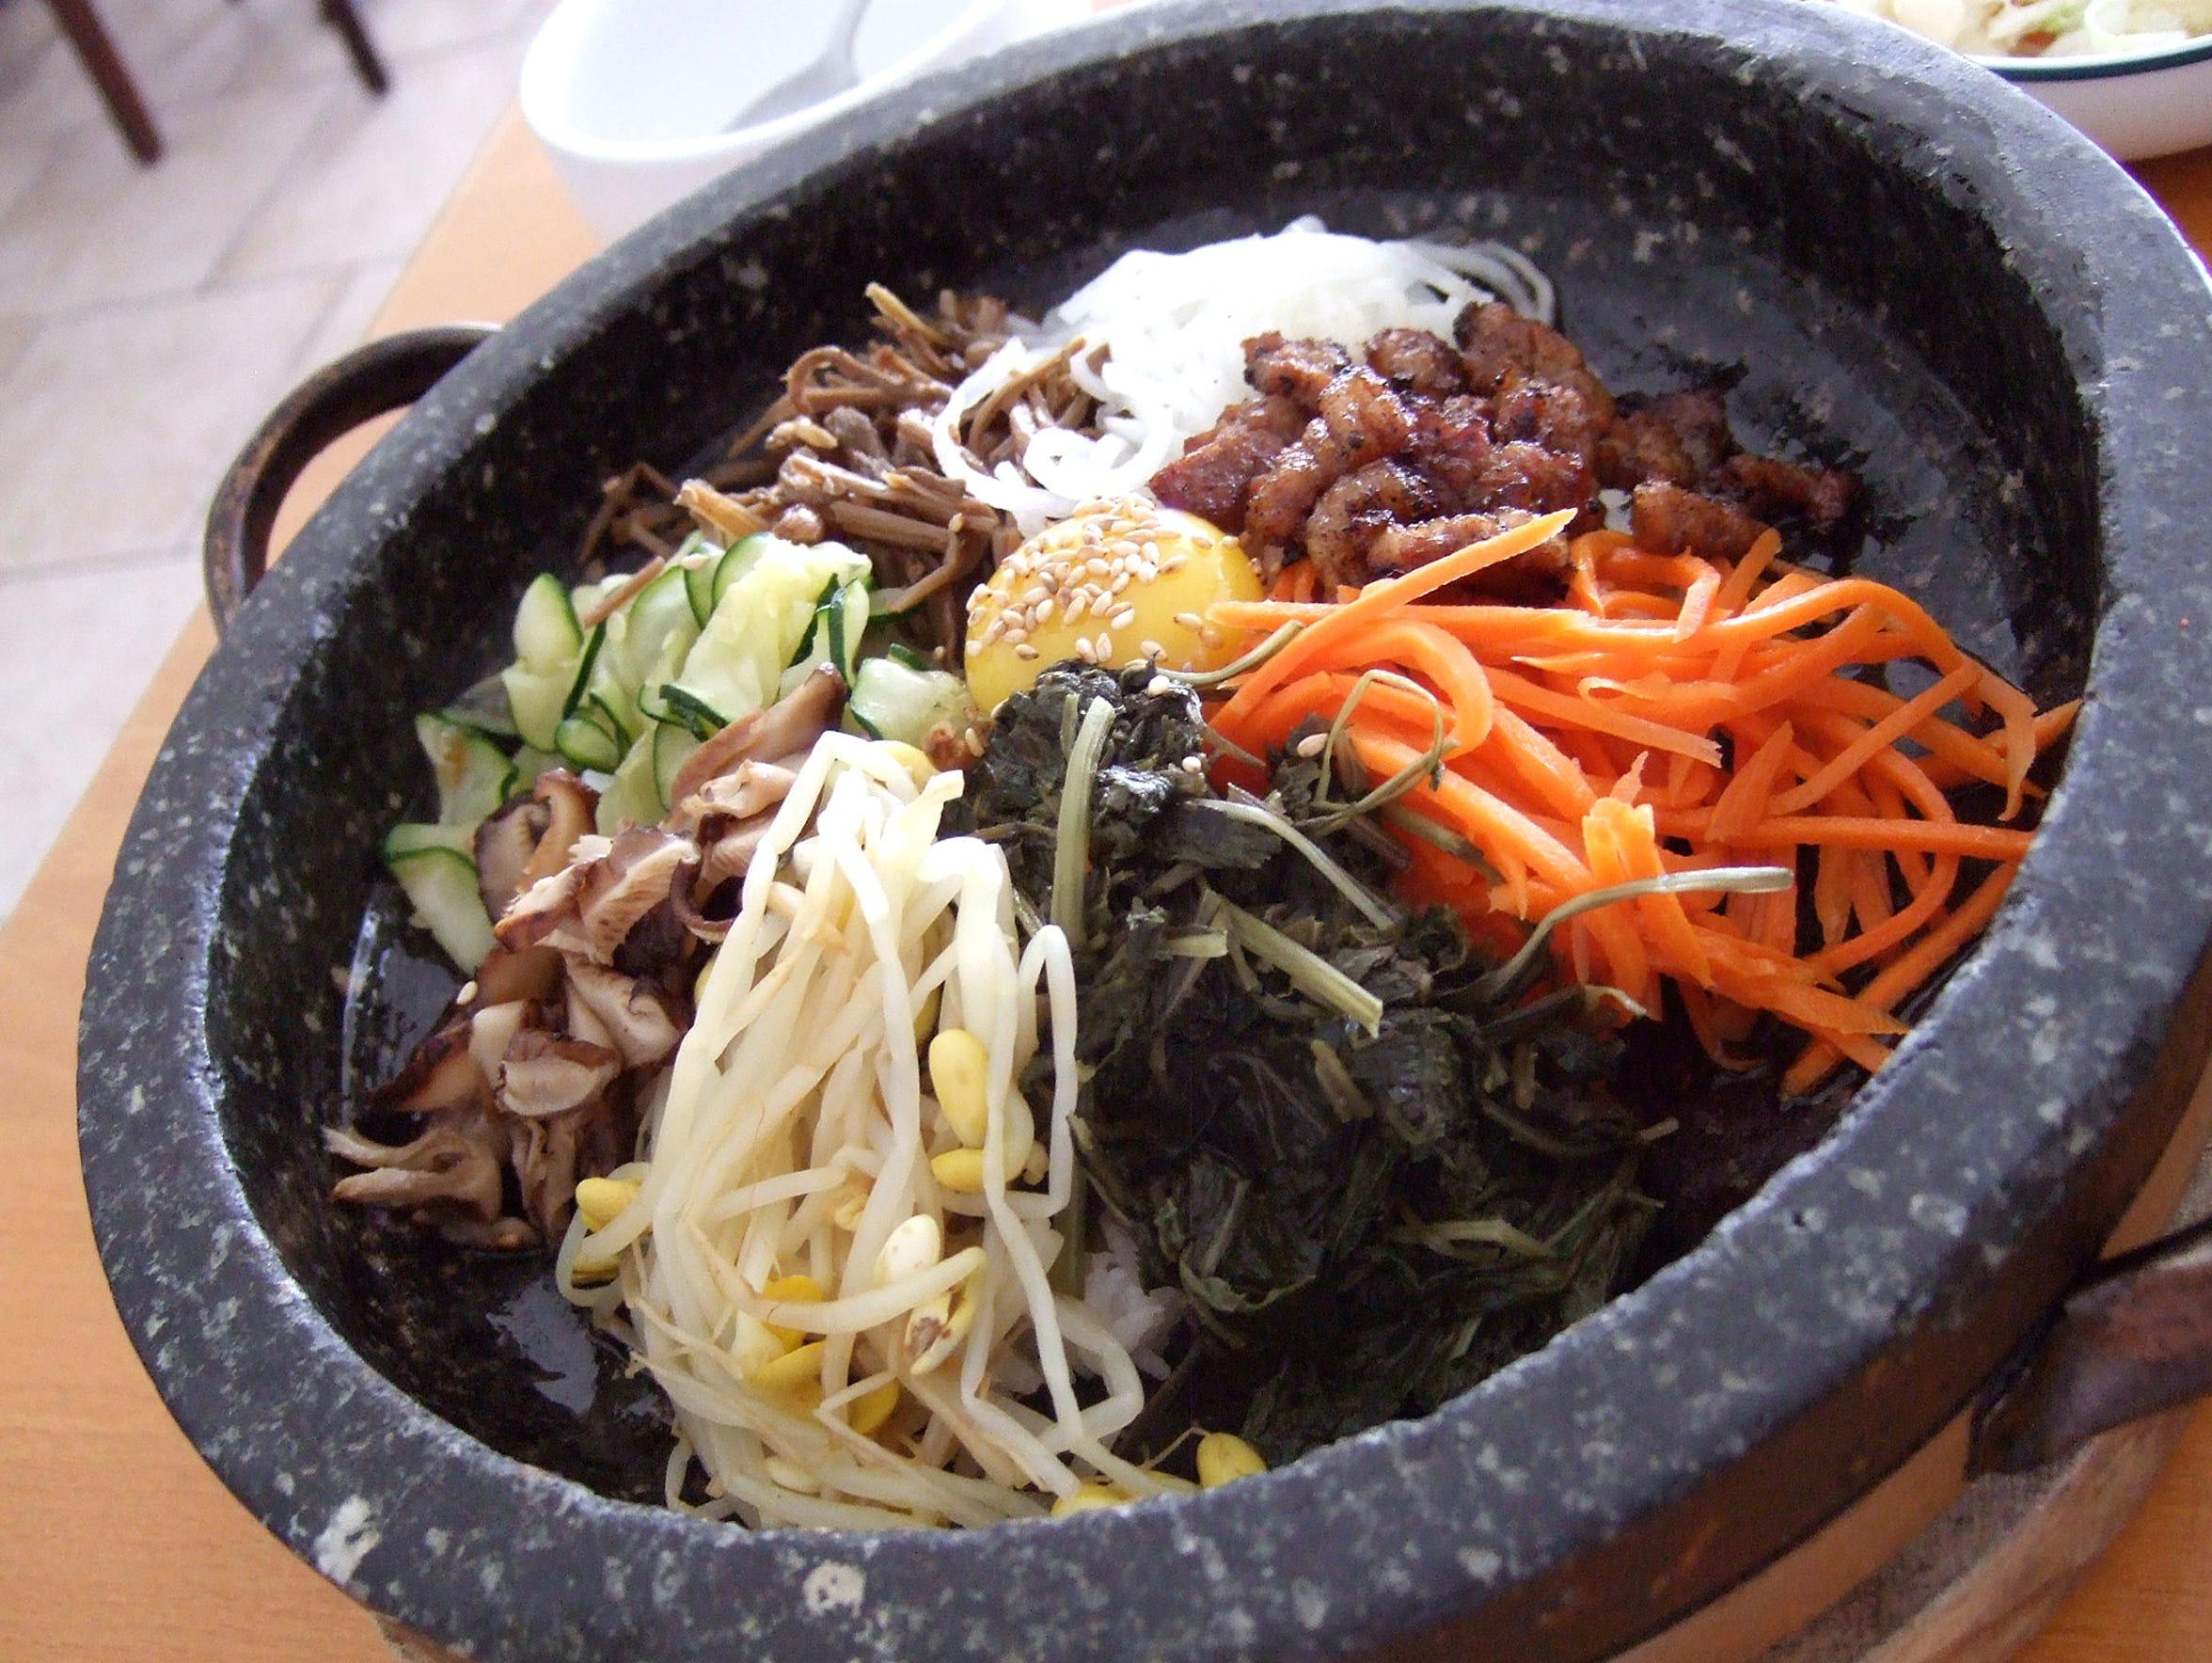 The bibimbap dish from Hodori, a restaurant serving